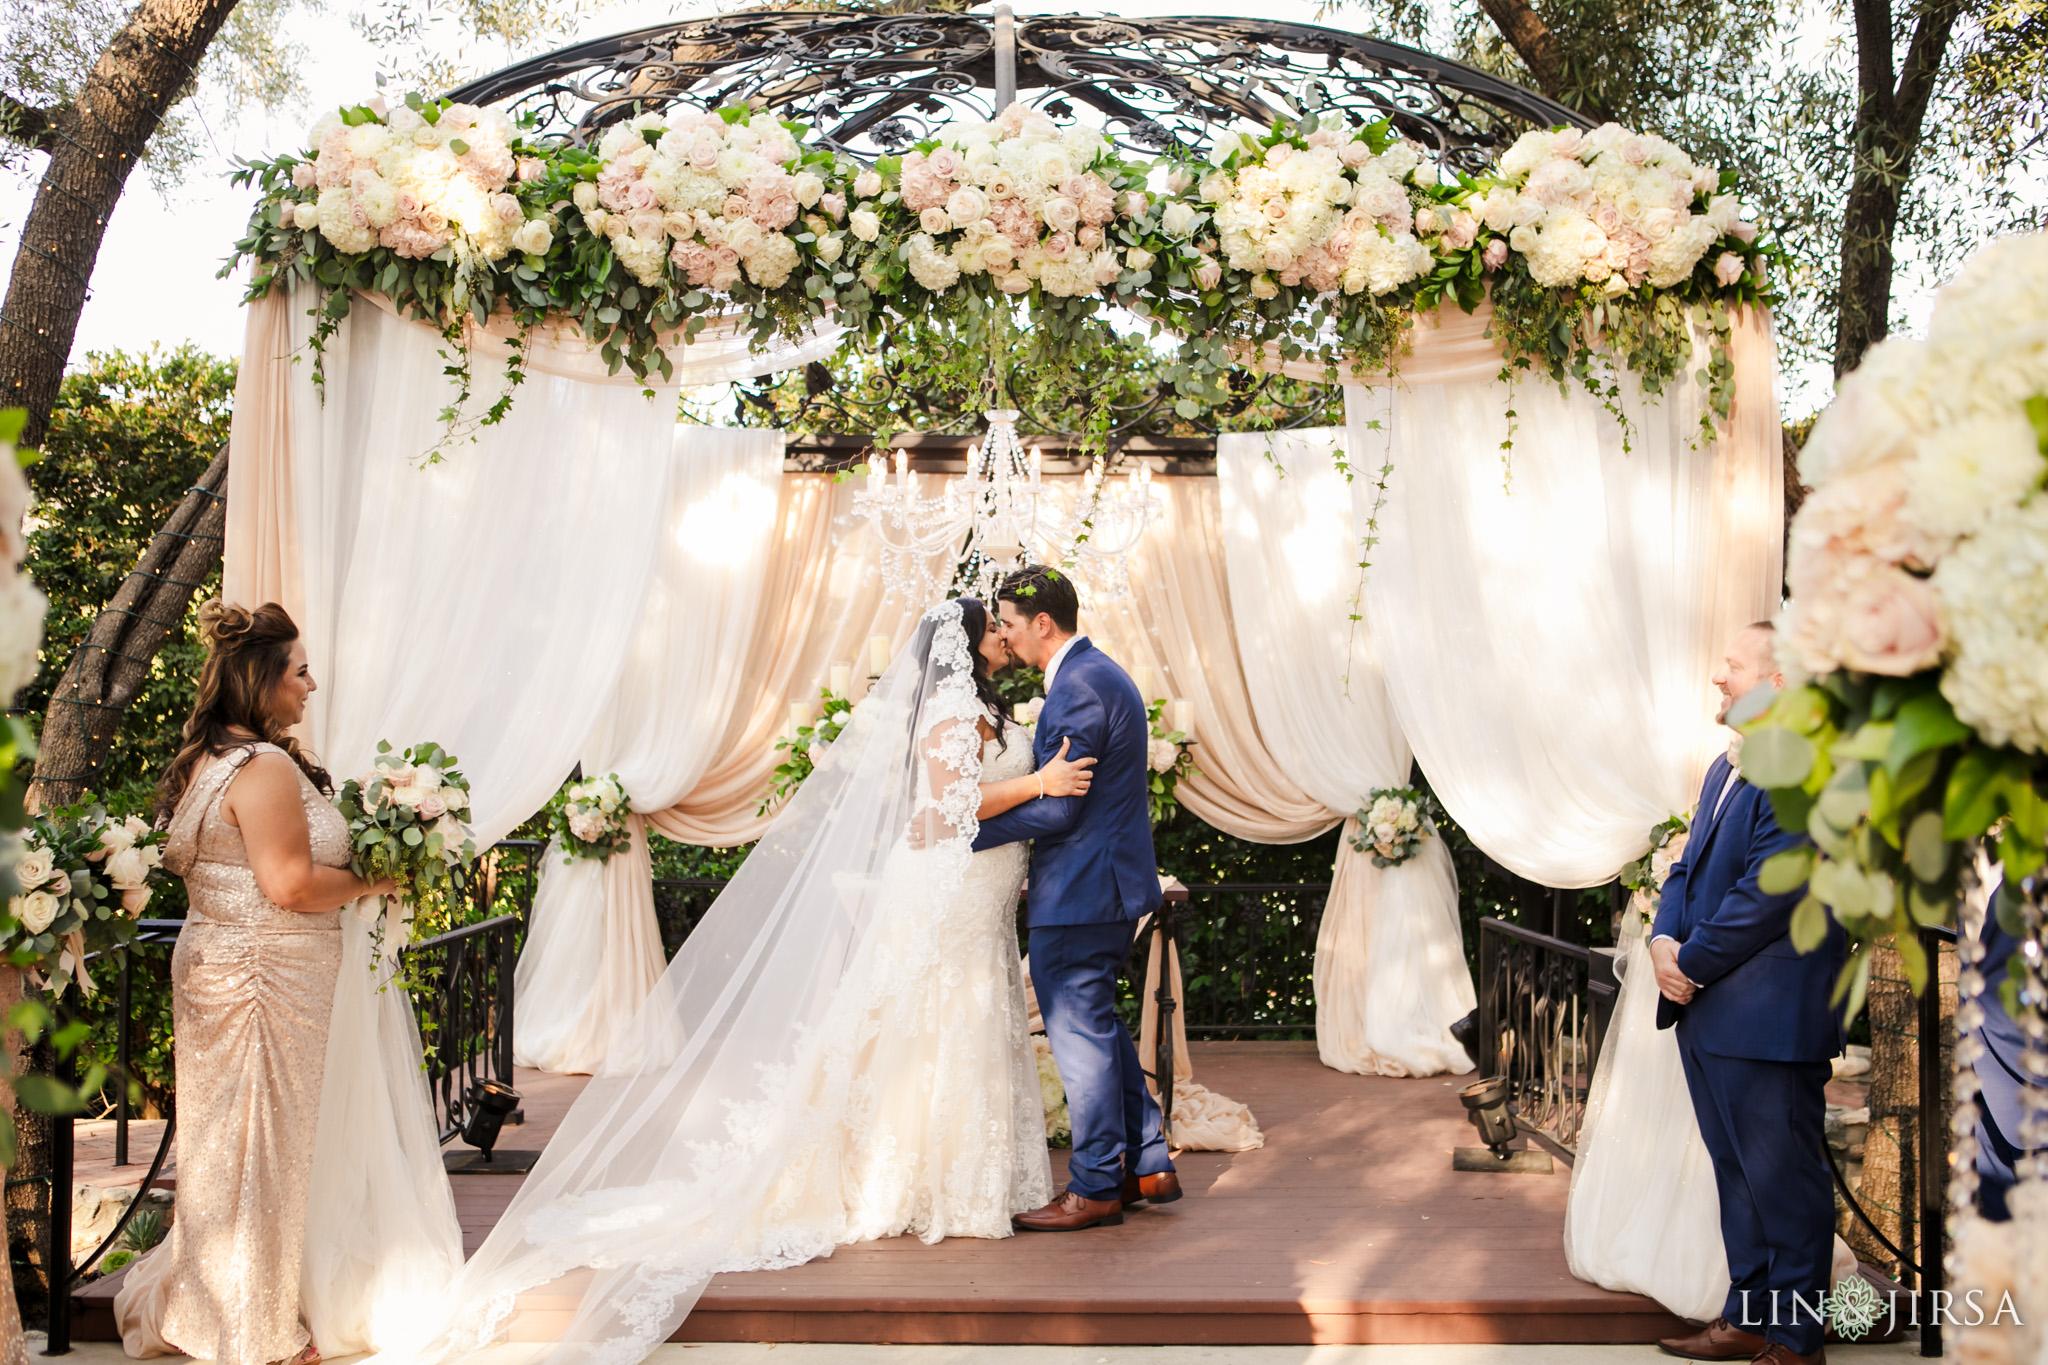 017 padua hills claremont wedding ceremony photography